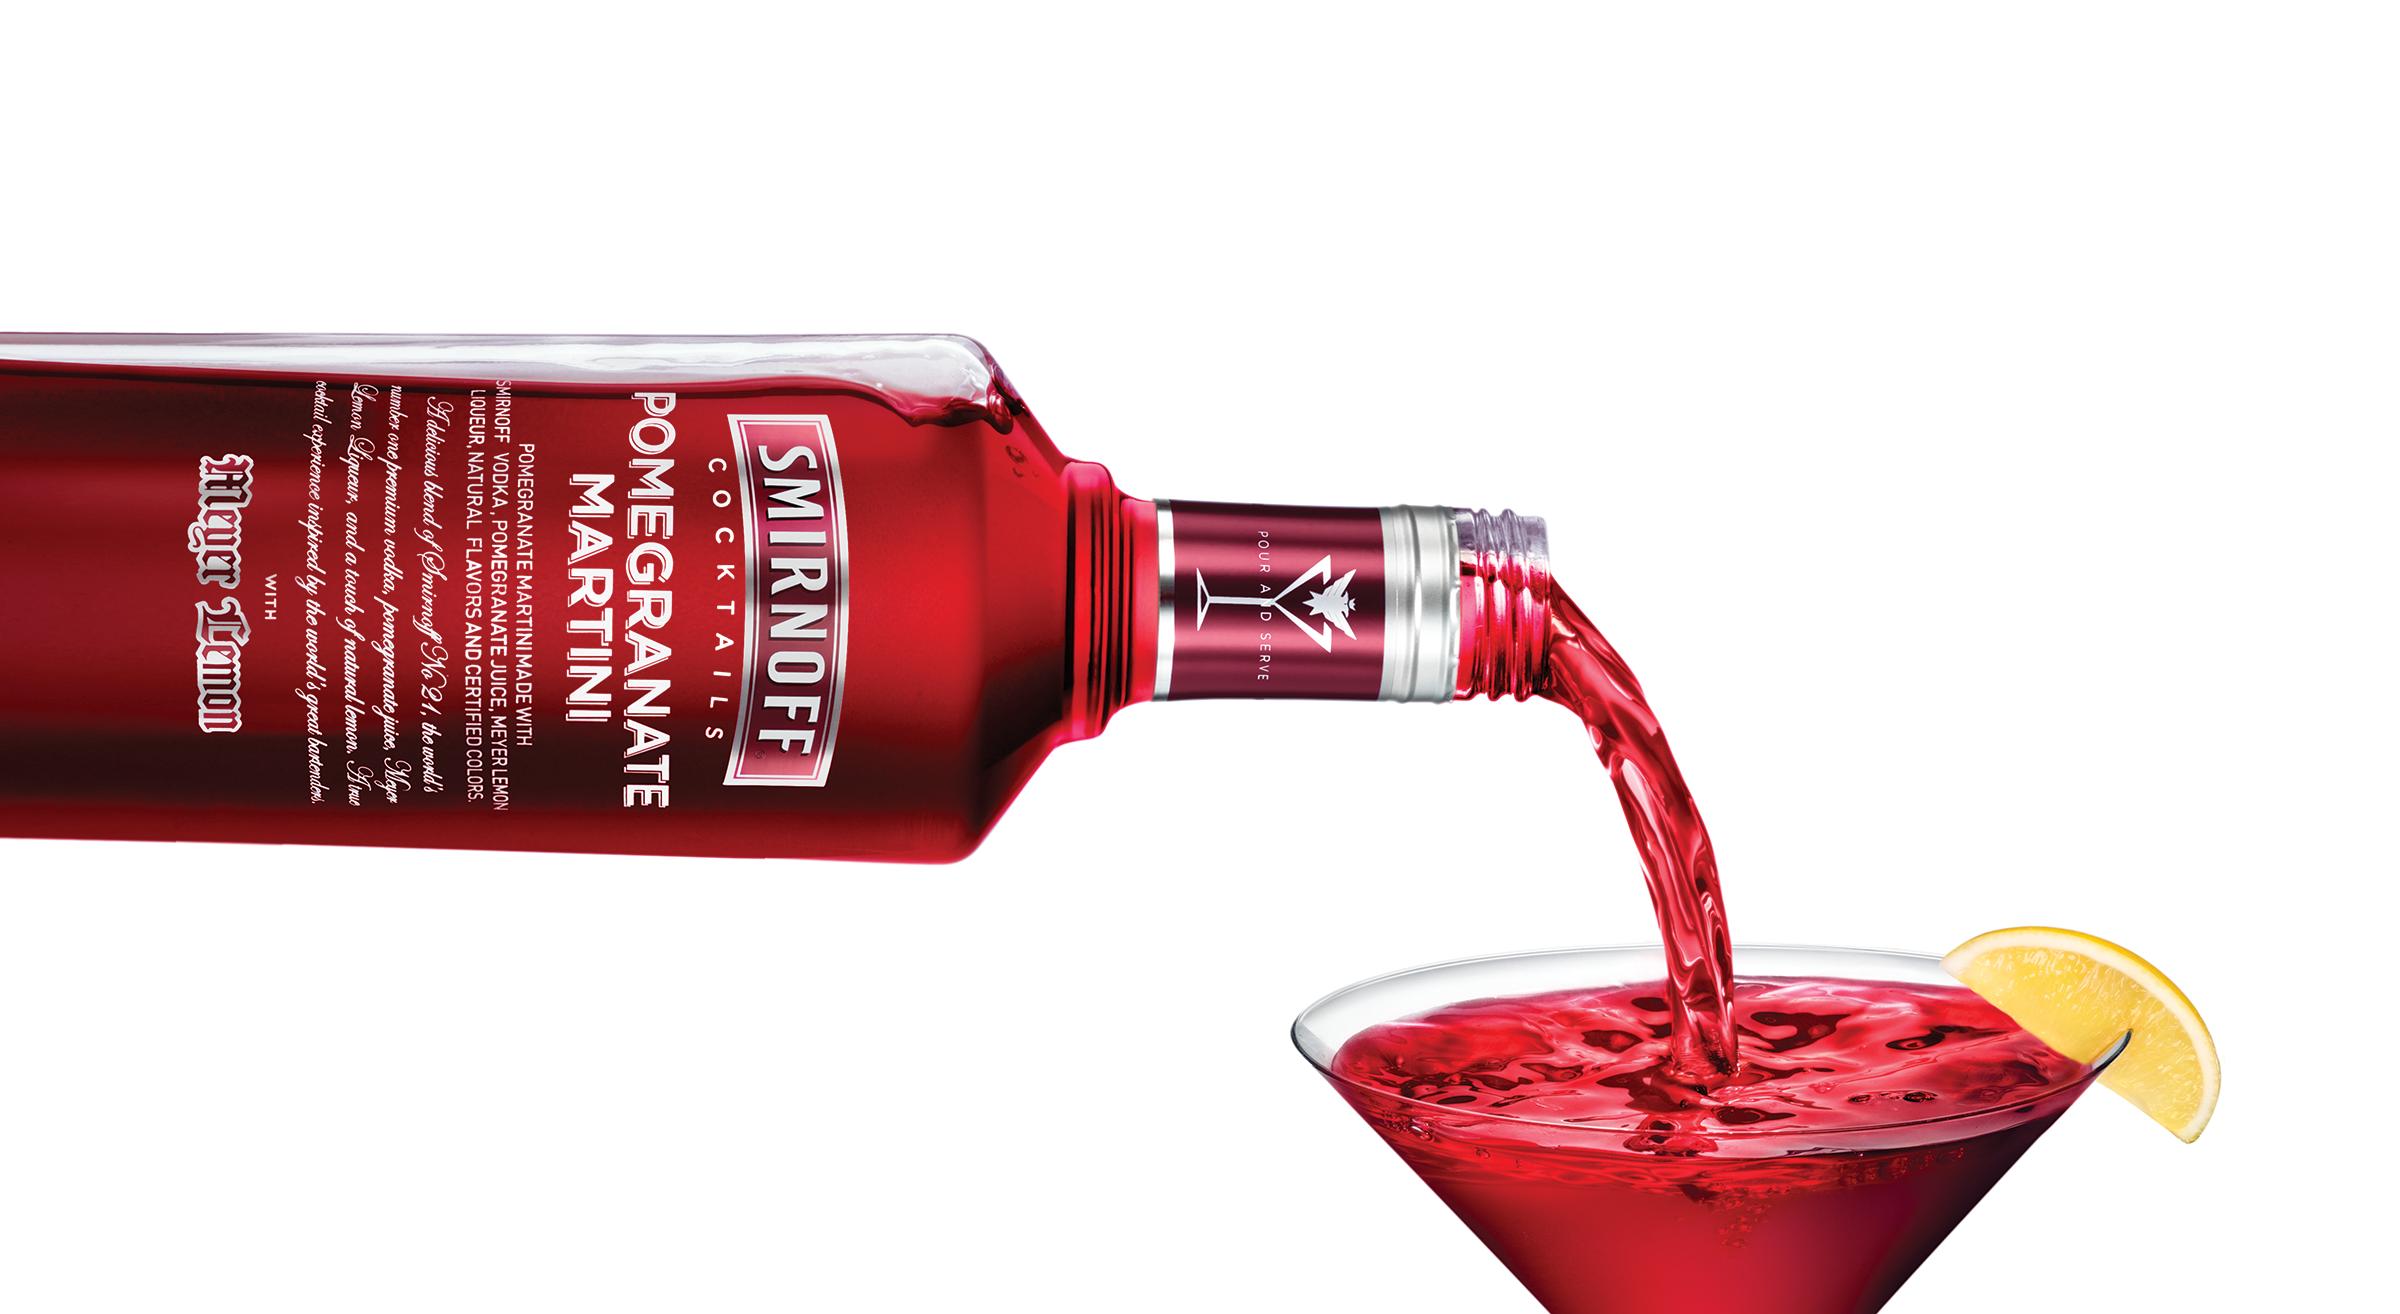 Smirnoff Cocktails Pomegranate Martini Poured